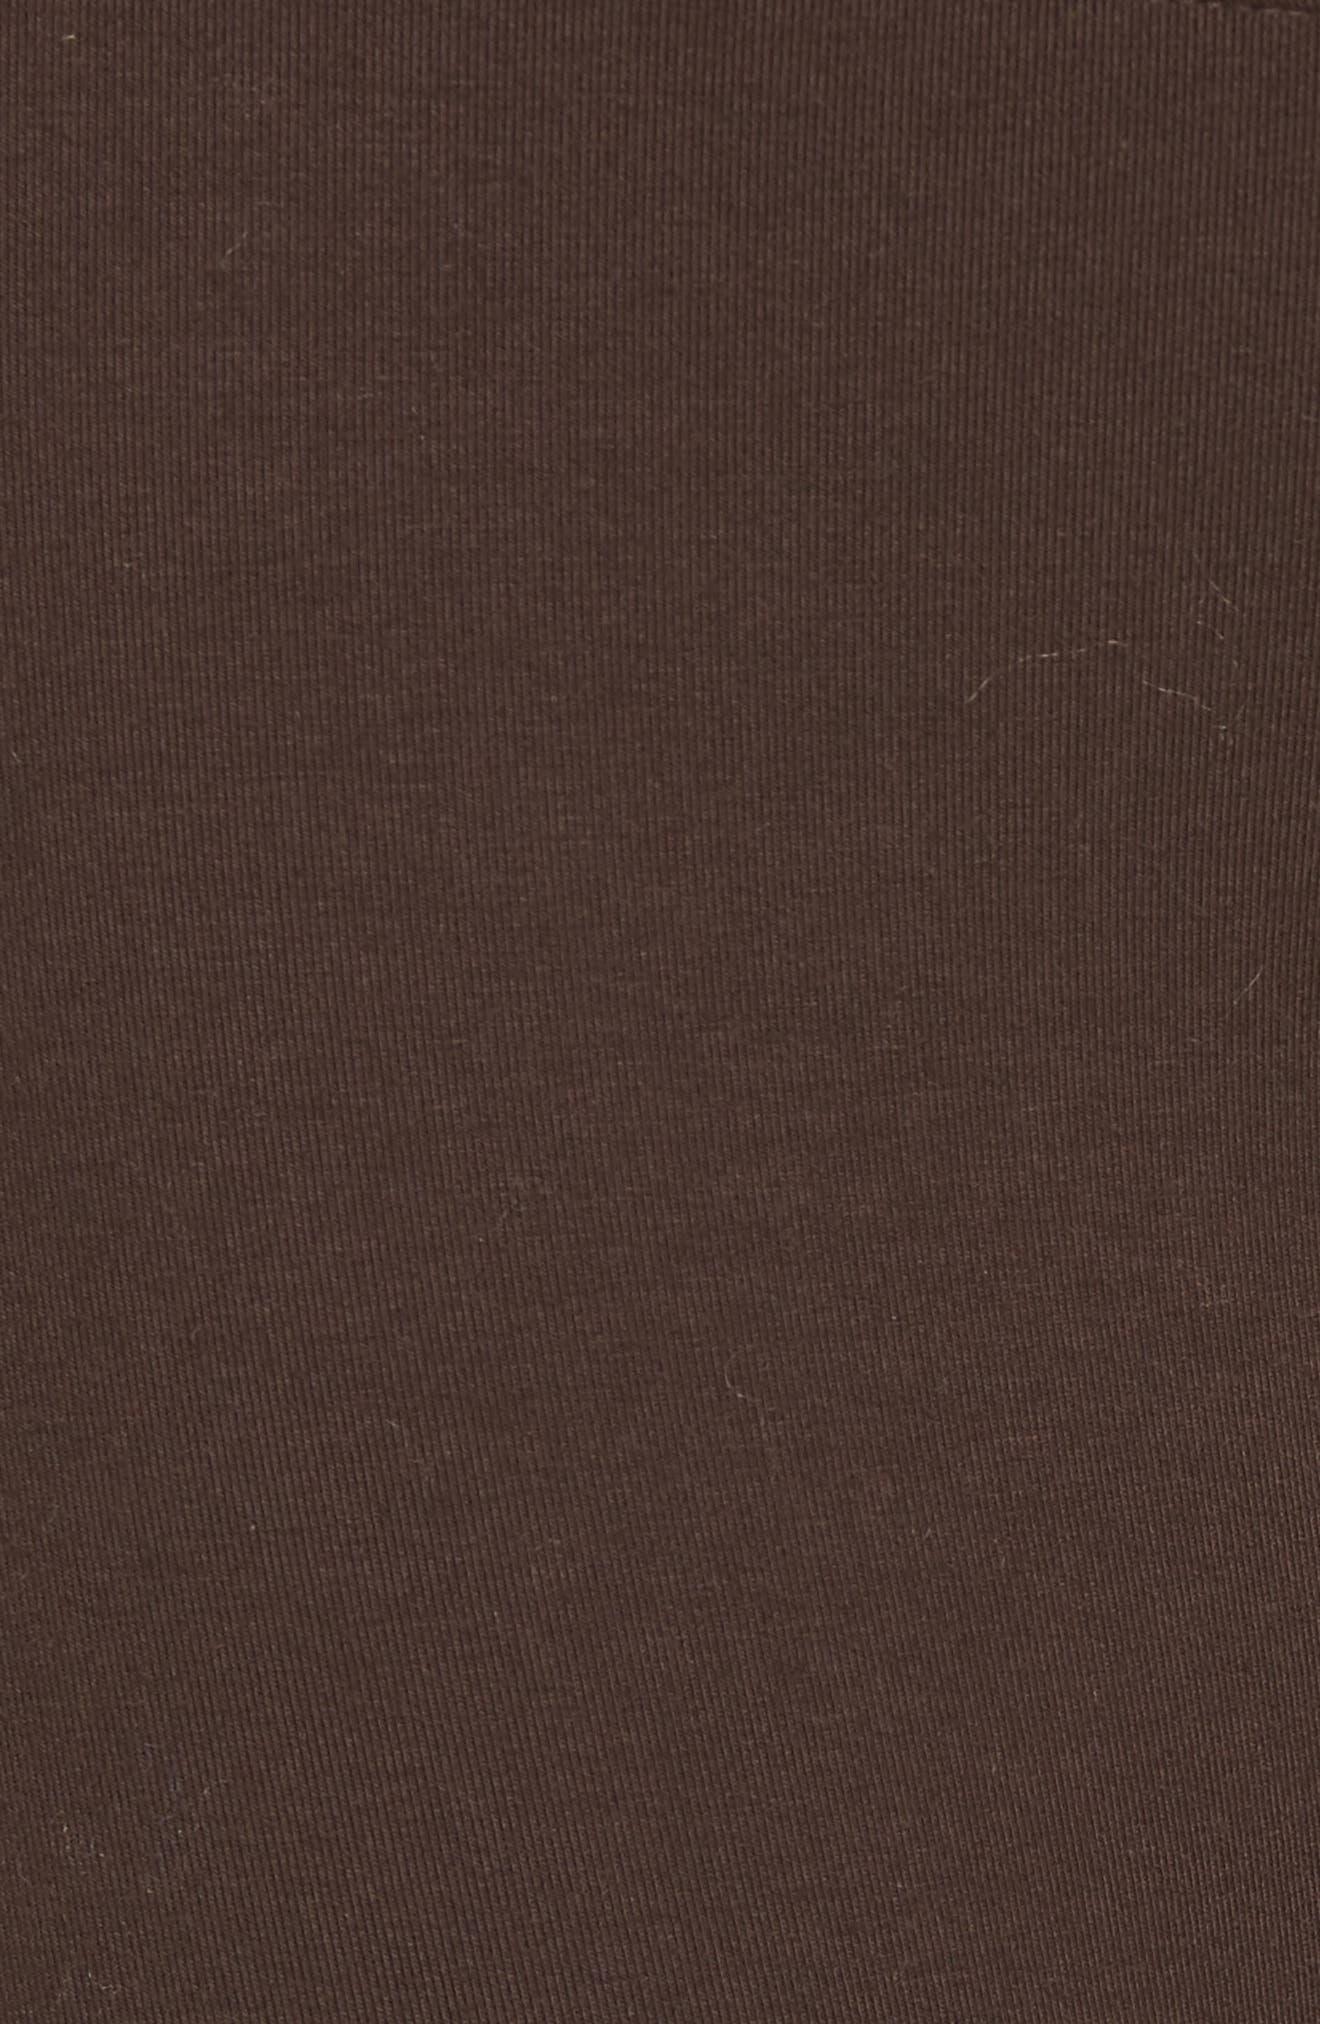 'Rachel' High Waist Leggings,                             Alternate thumbnail 5, color,                             CHOCOLATE TORTE